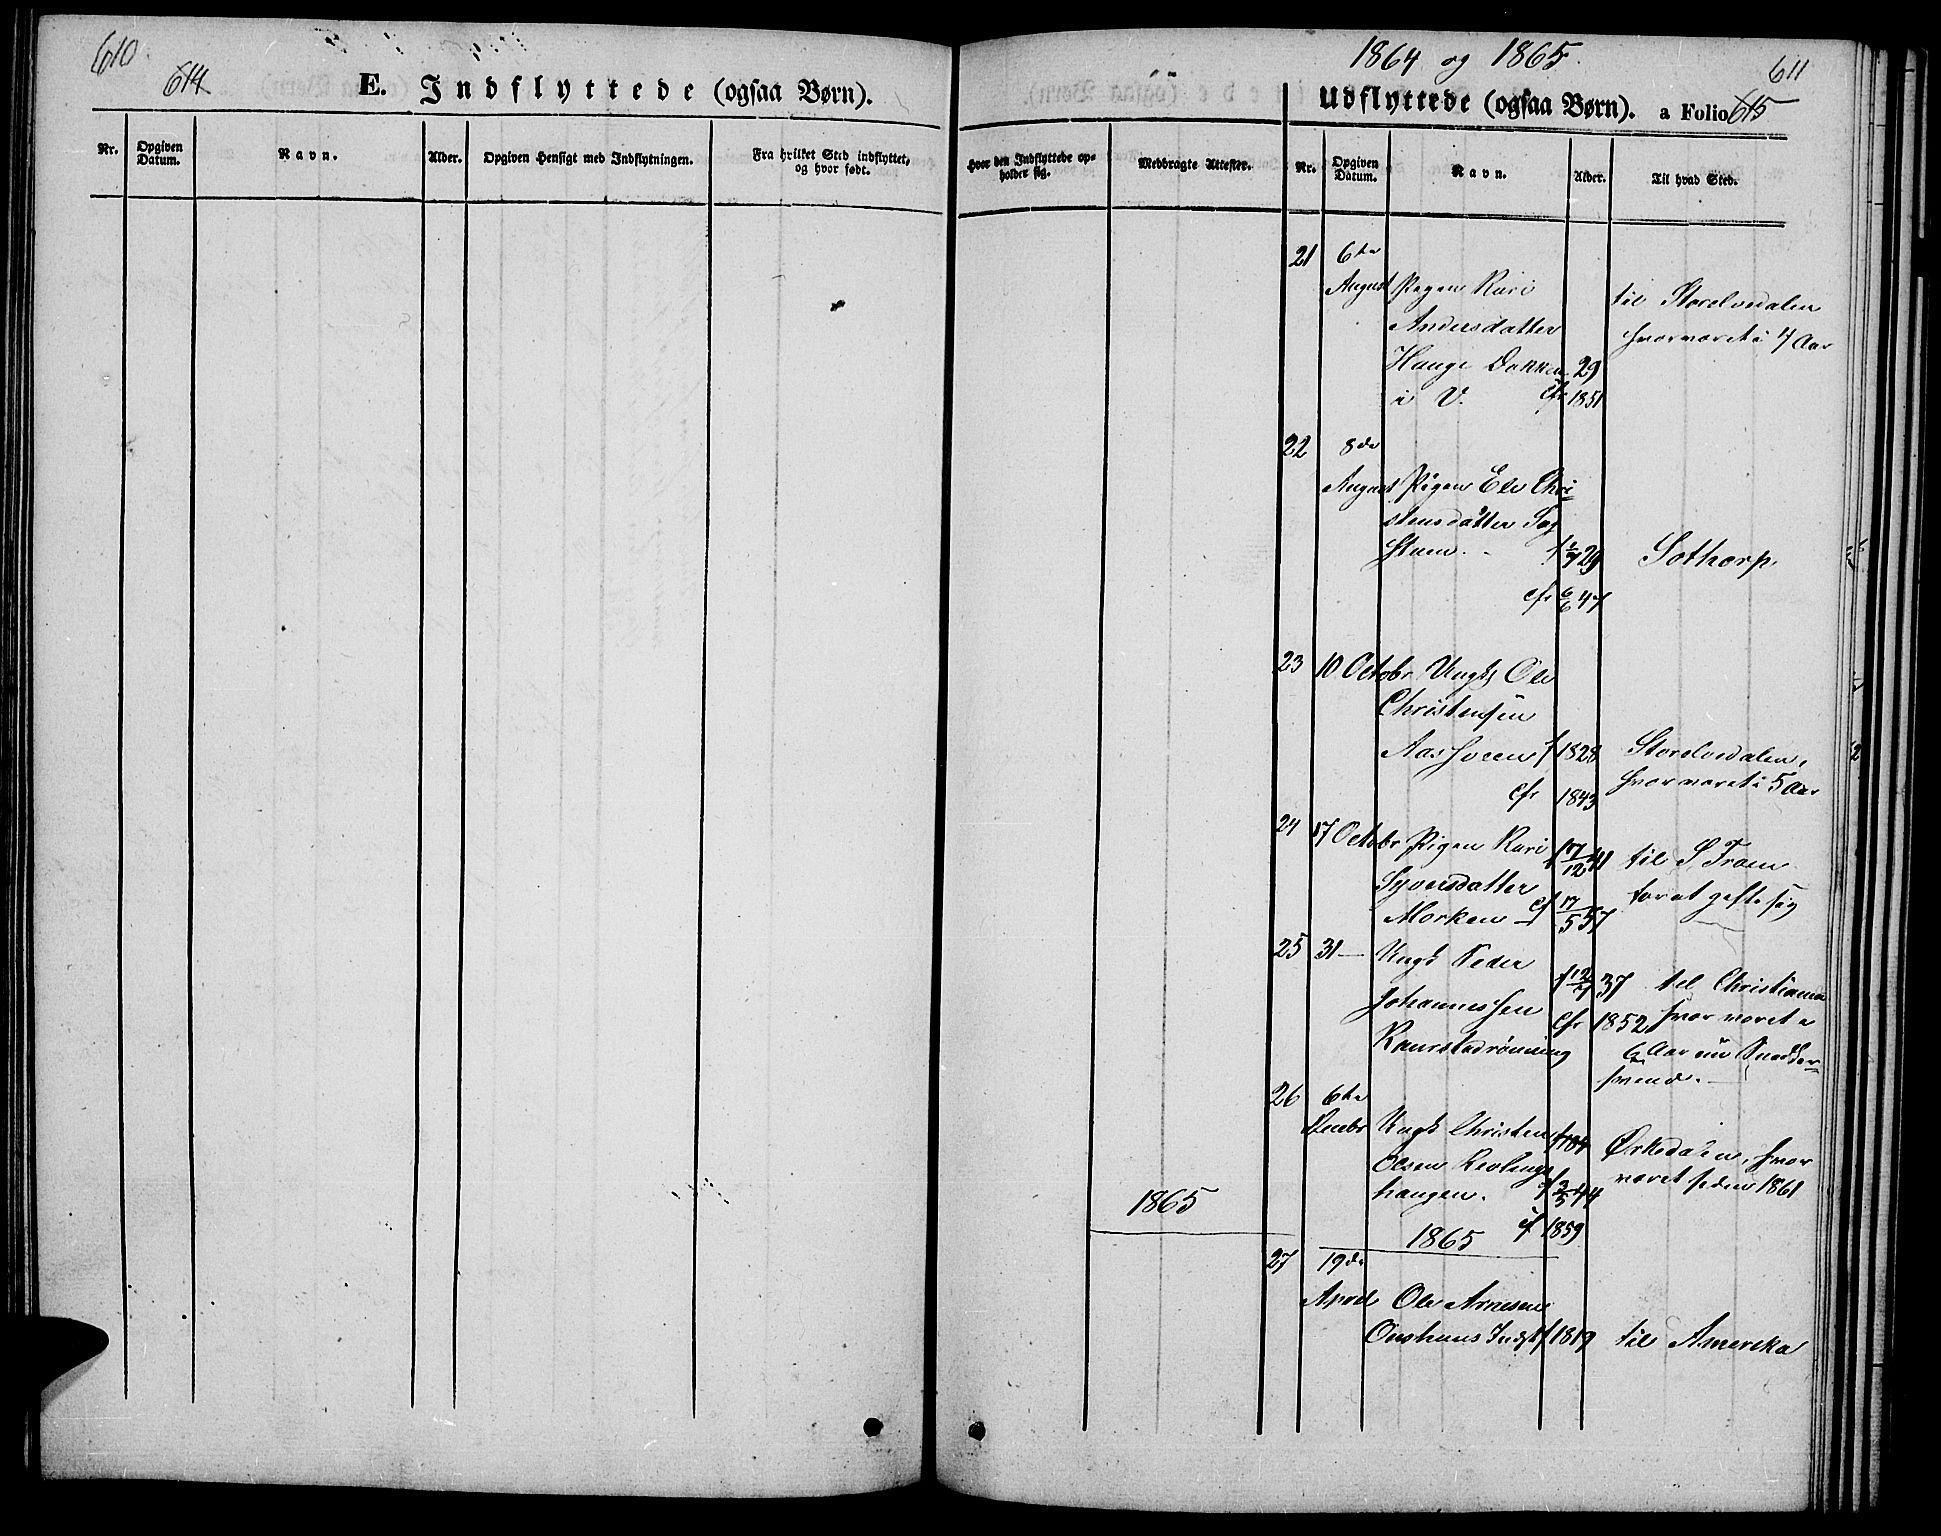 SAH, Ringebu prestekontor, Klokkerbok nr. 3, 1854-1866, s. 610-611